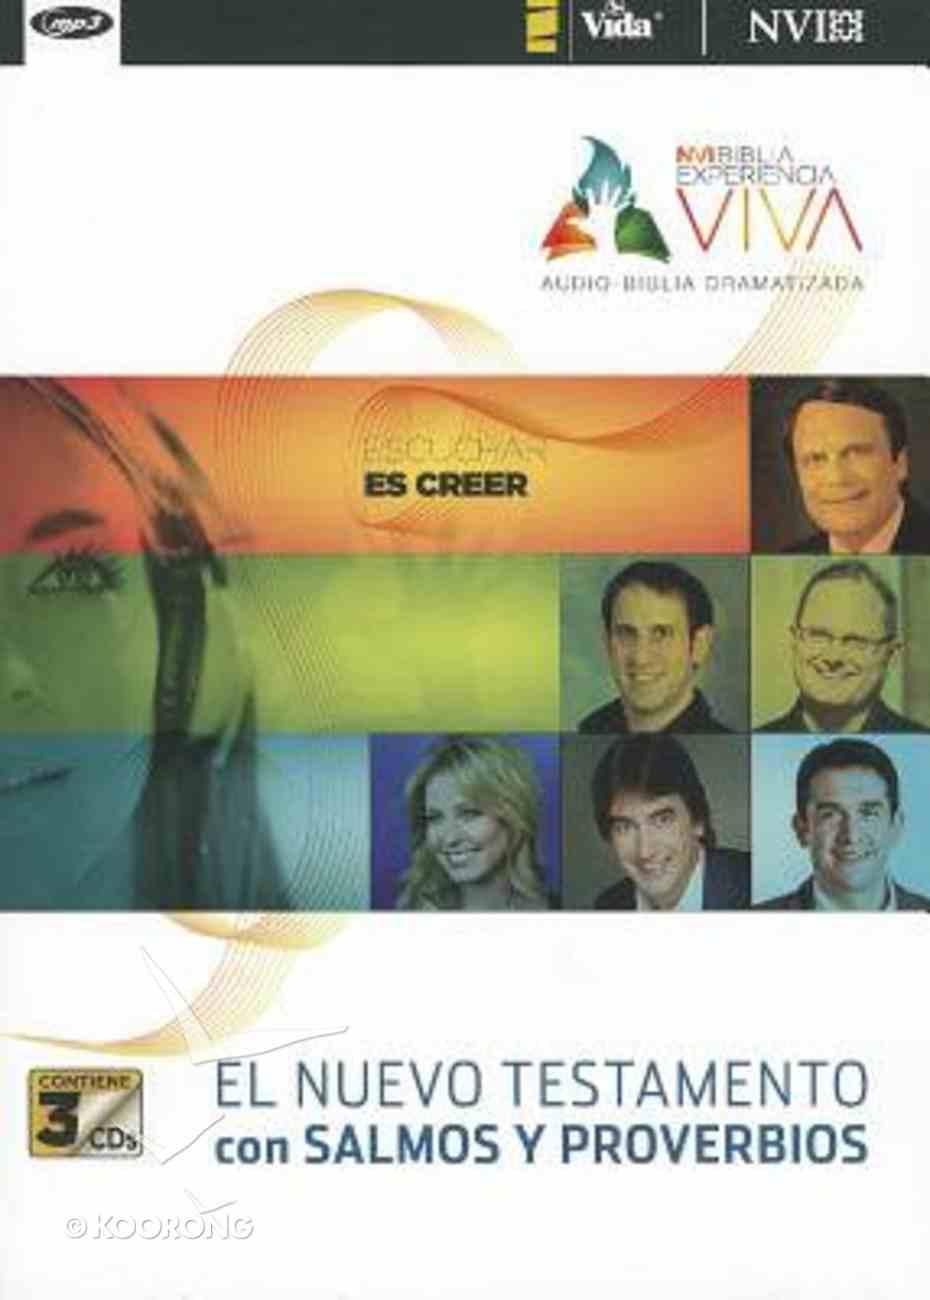 Experiencia Viva Nuevo Testamento Con Salmos Y Proverbios (Living Experince New Testament With Psalms and Proverbs) (Mp3) CD